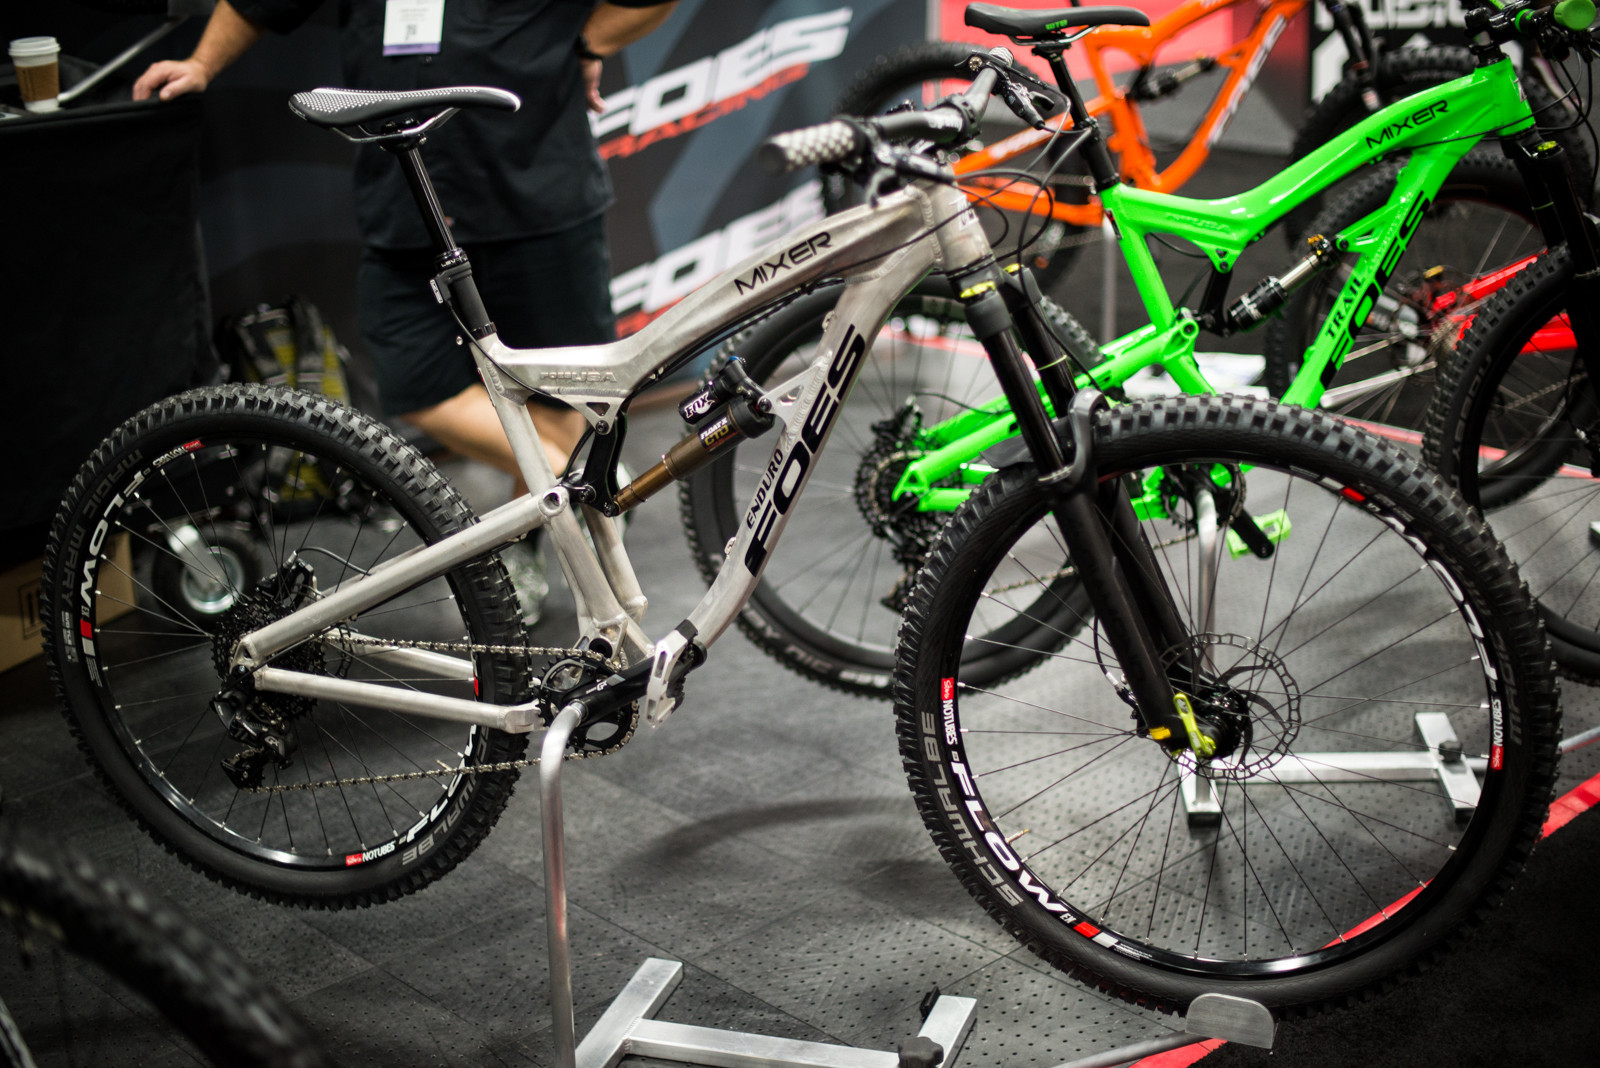 2016 Foes Mixer Trail & Enduro - 2016 Trail and Enduro Bikes at Interbike - Mountain Biking Pictures - Vital MTB